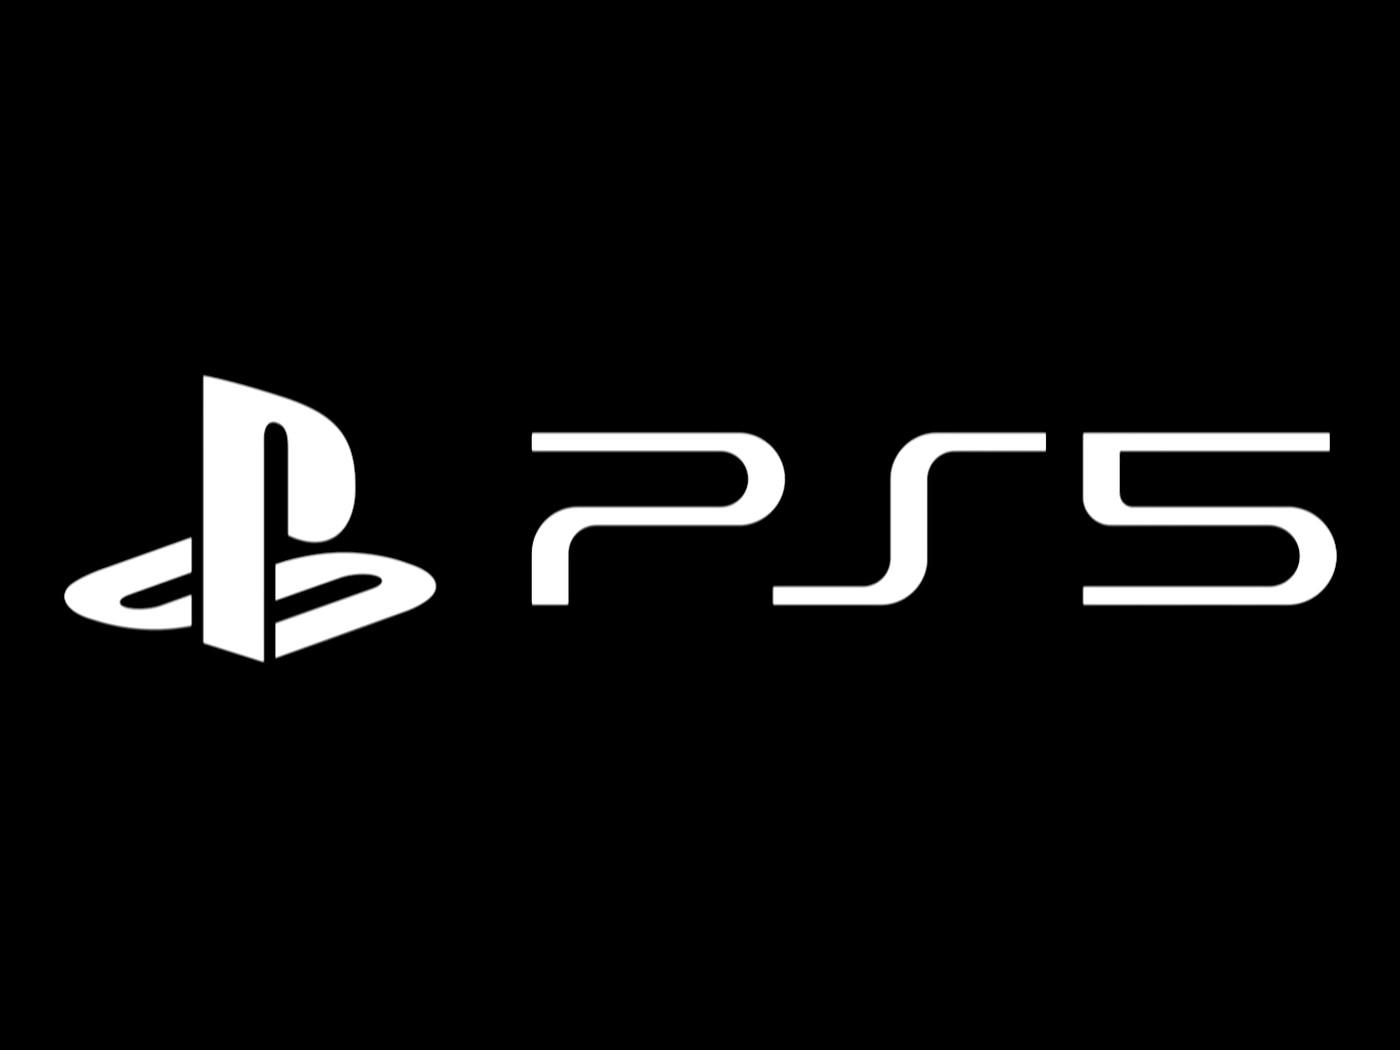 Walmart Sony PlayStation 5 Coupon Code